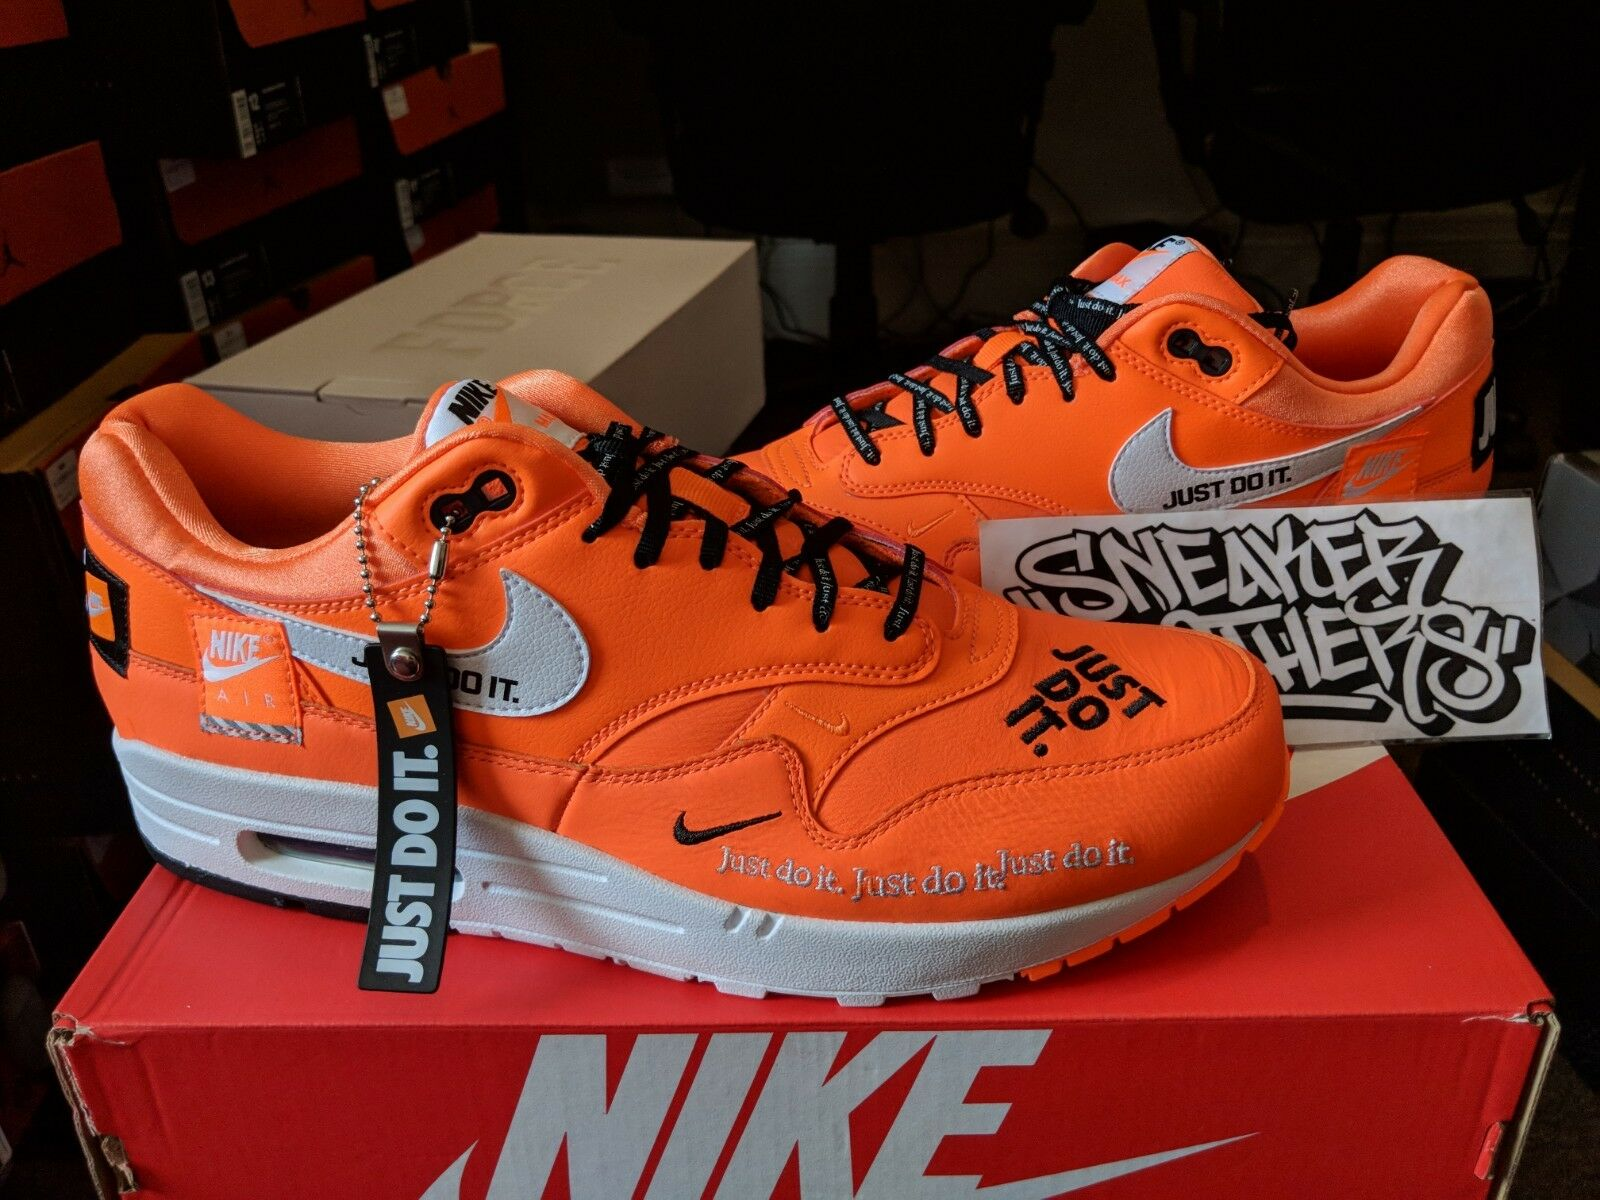 Nike Air Max 1 SE JDI Just Do It Total Men Orange White Black Running Men Total AO1021-800 fb196e